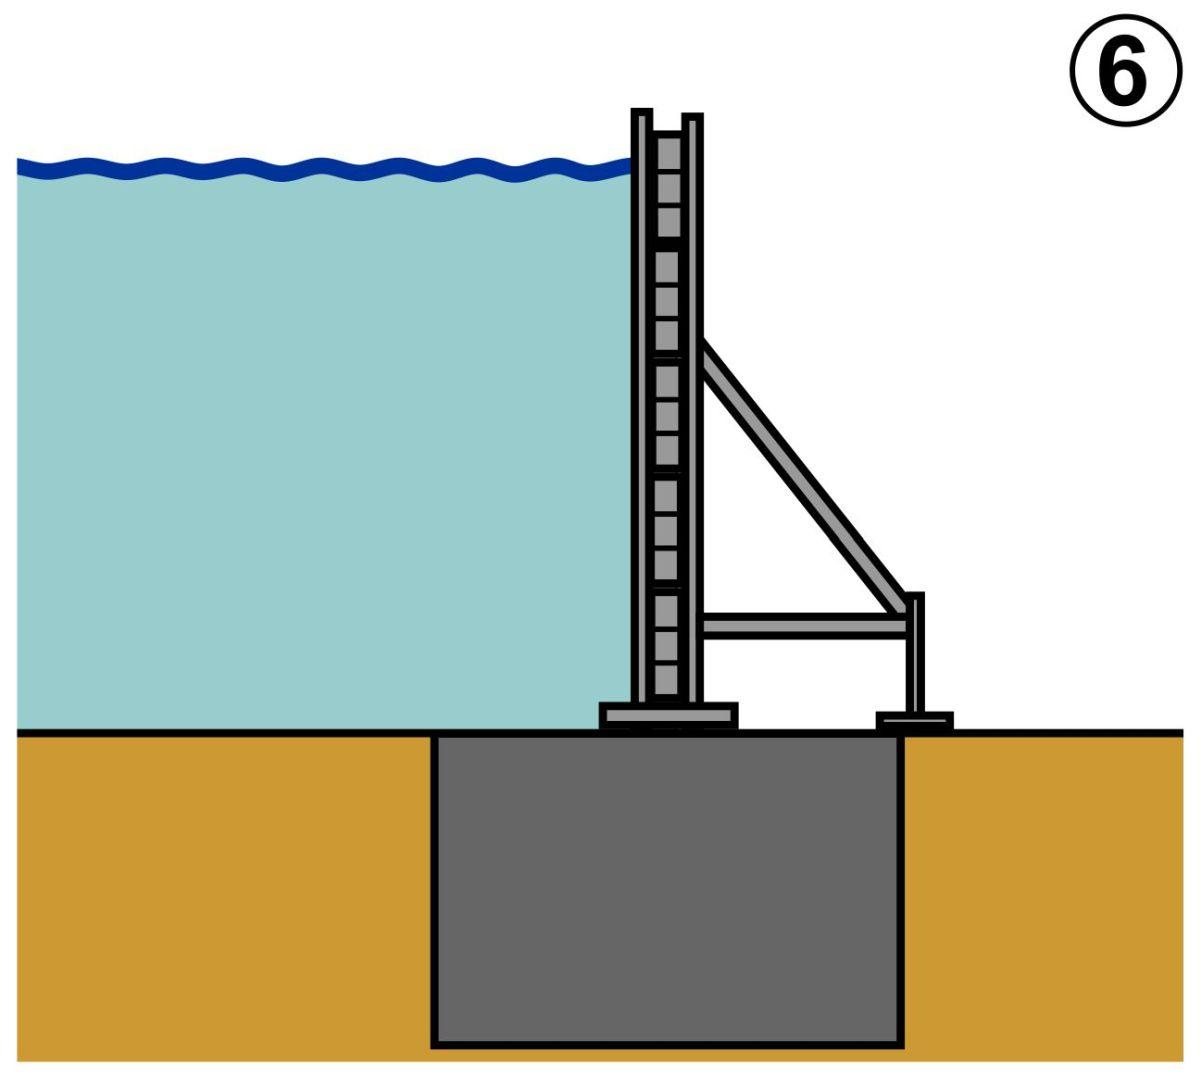 Mobiler Hochwasserschutz Alu Dammbalkensystem